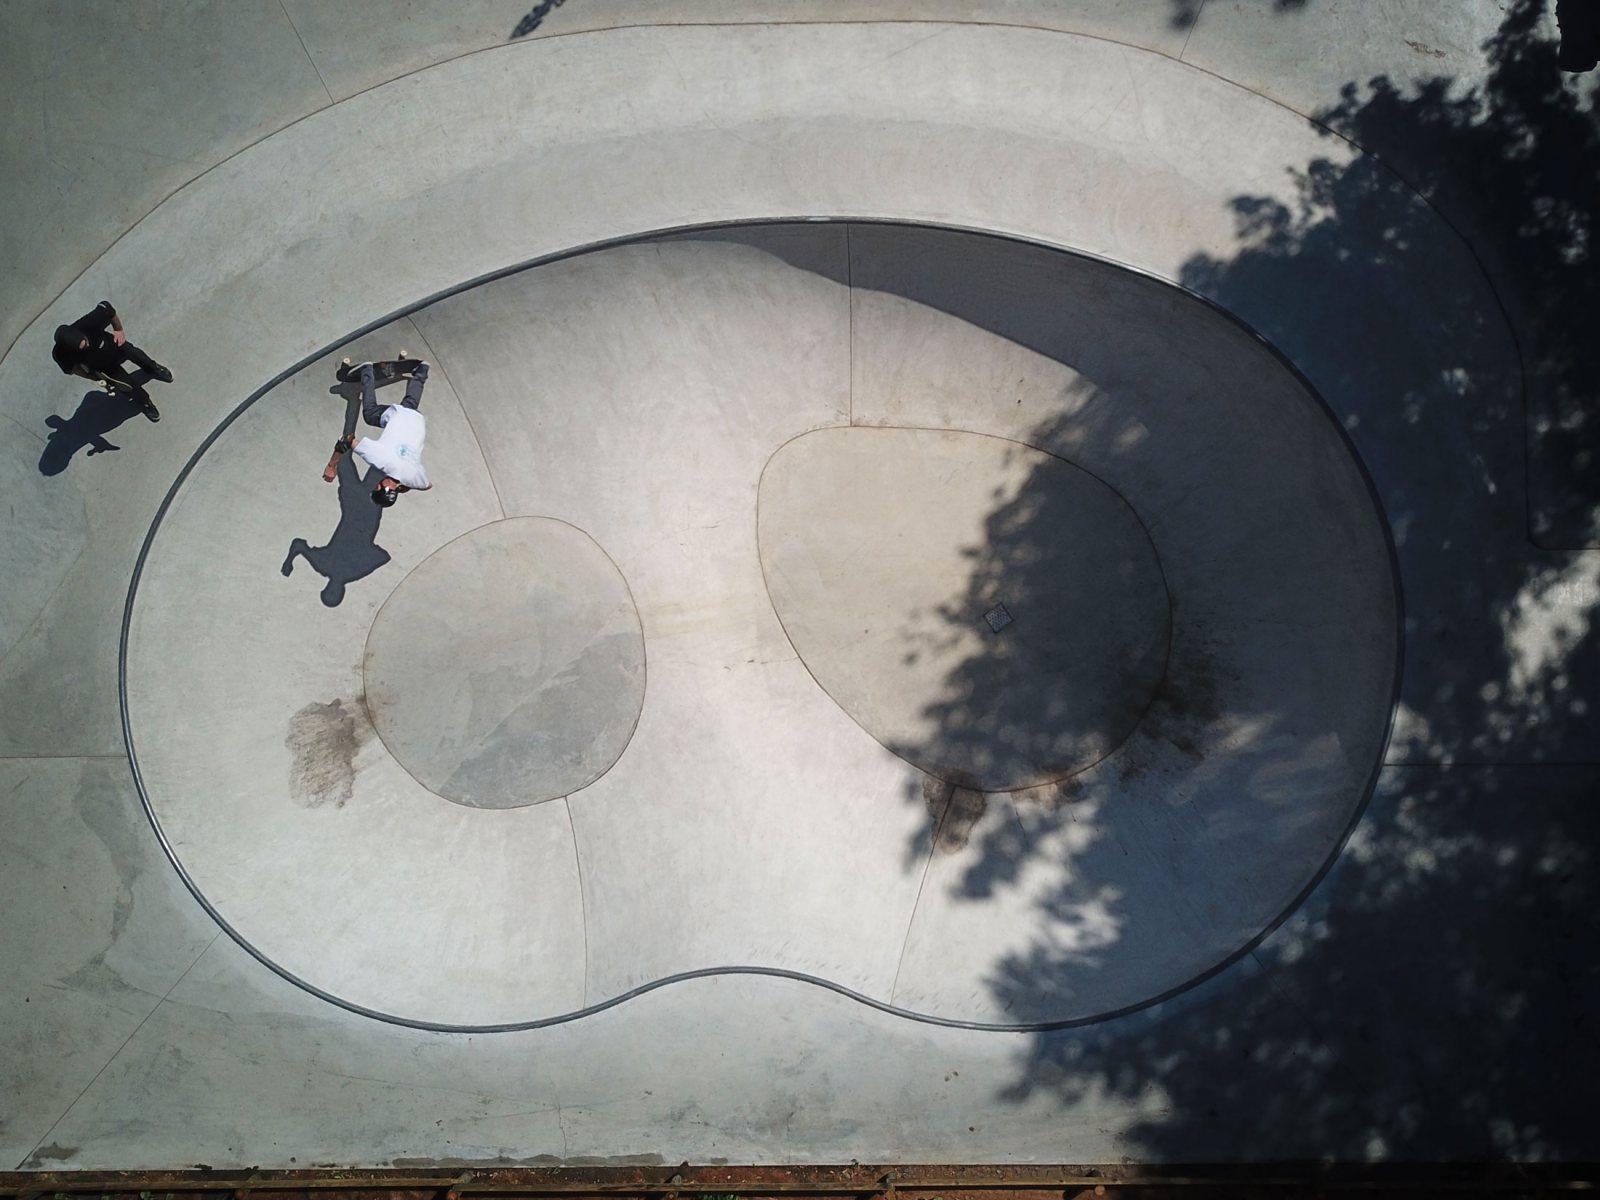 Skatepark_Sonsbeck_05.20_01